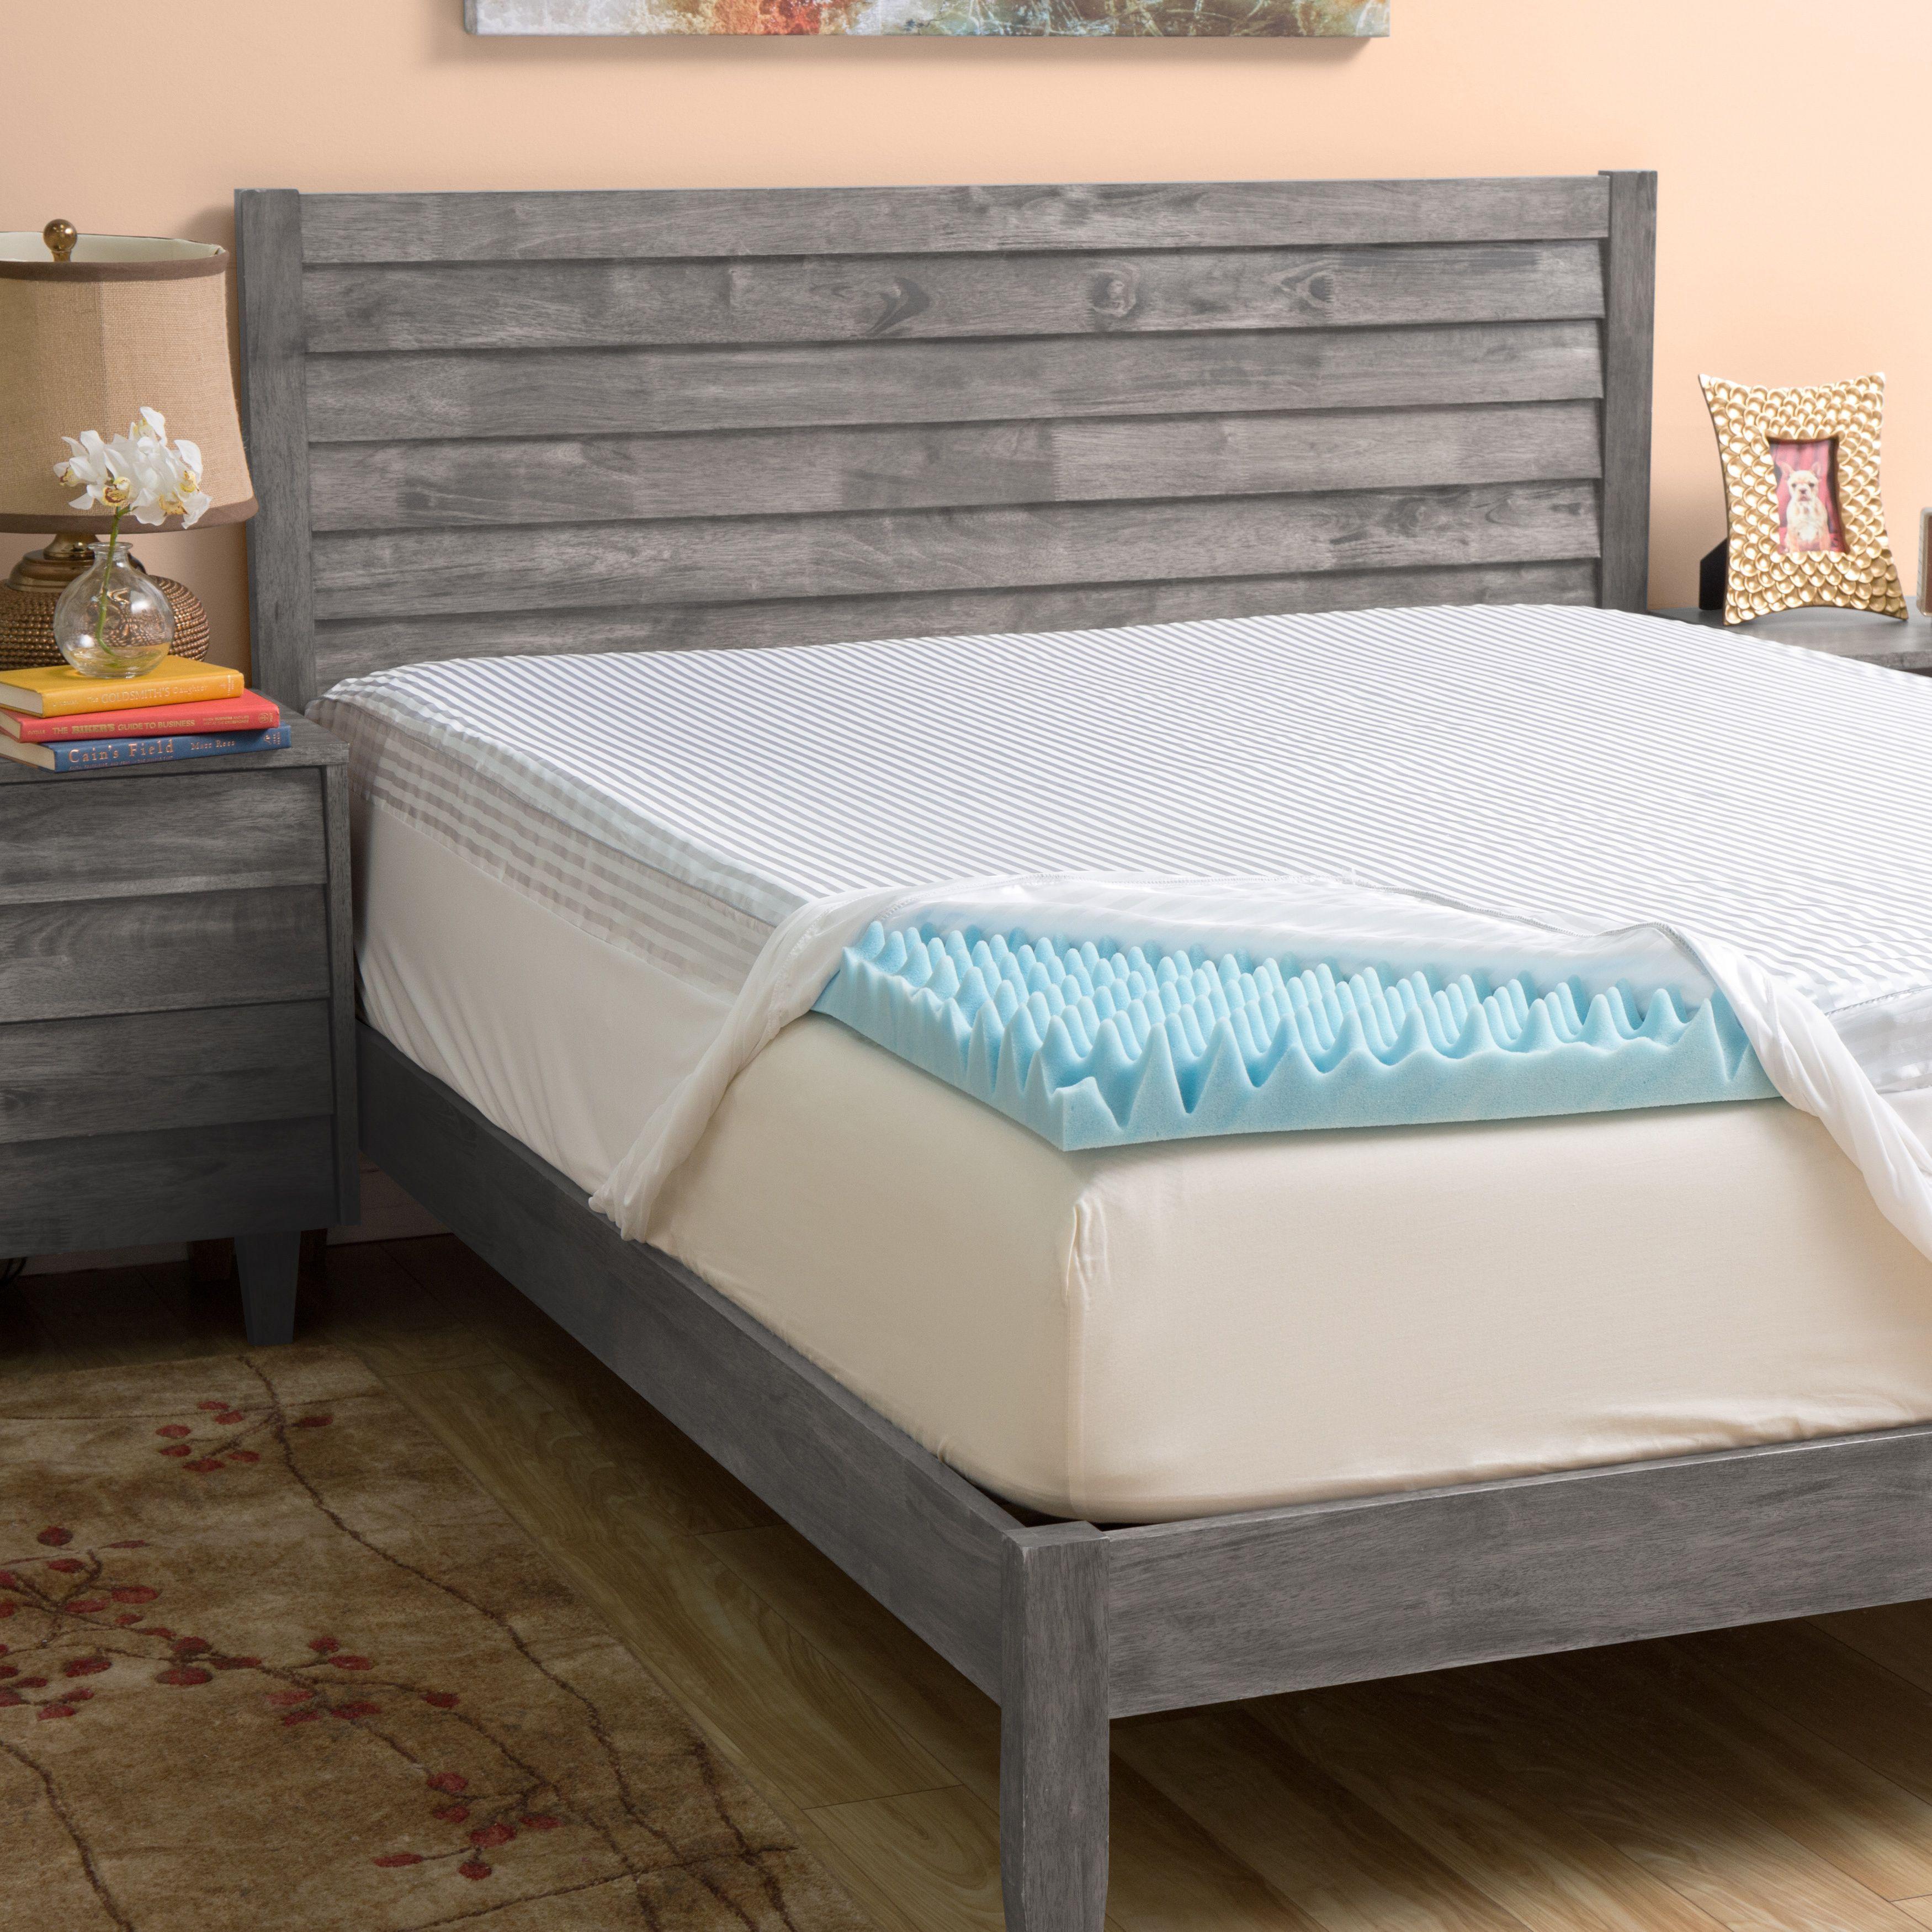 inch gel queen ostkcdn size prod medium foundation and set firm p memory topper select luxury src foam mattress com